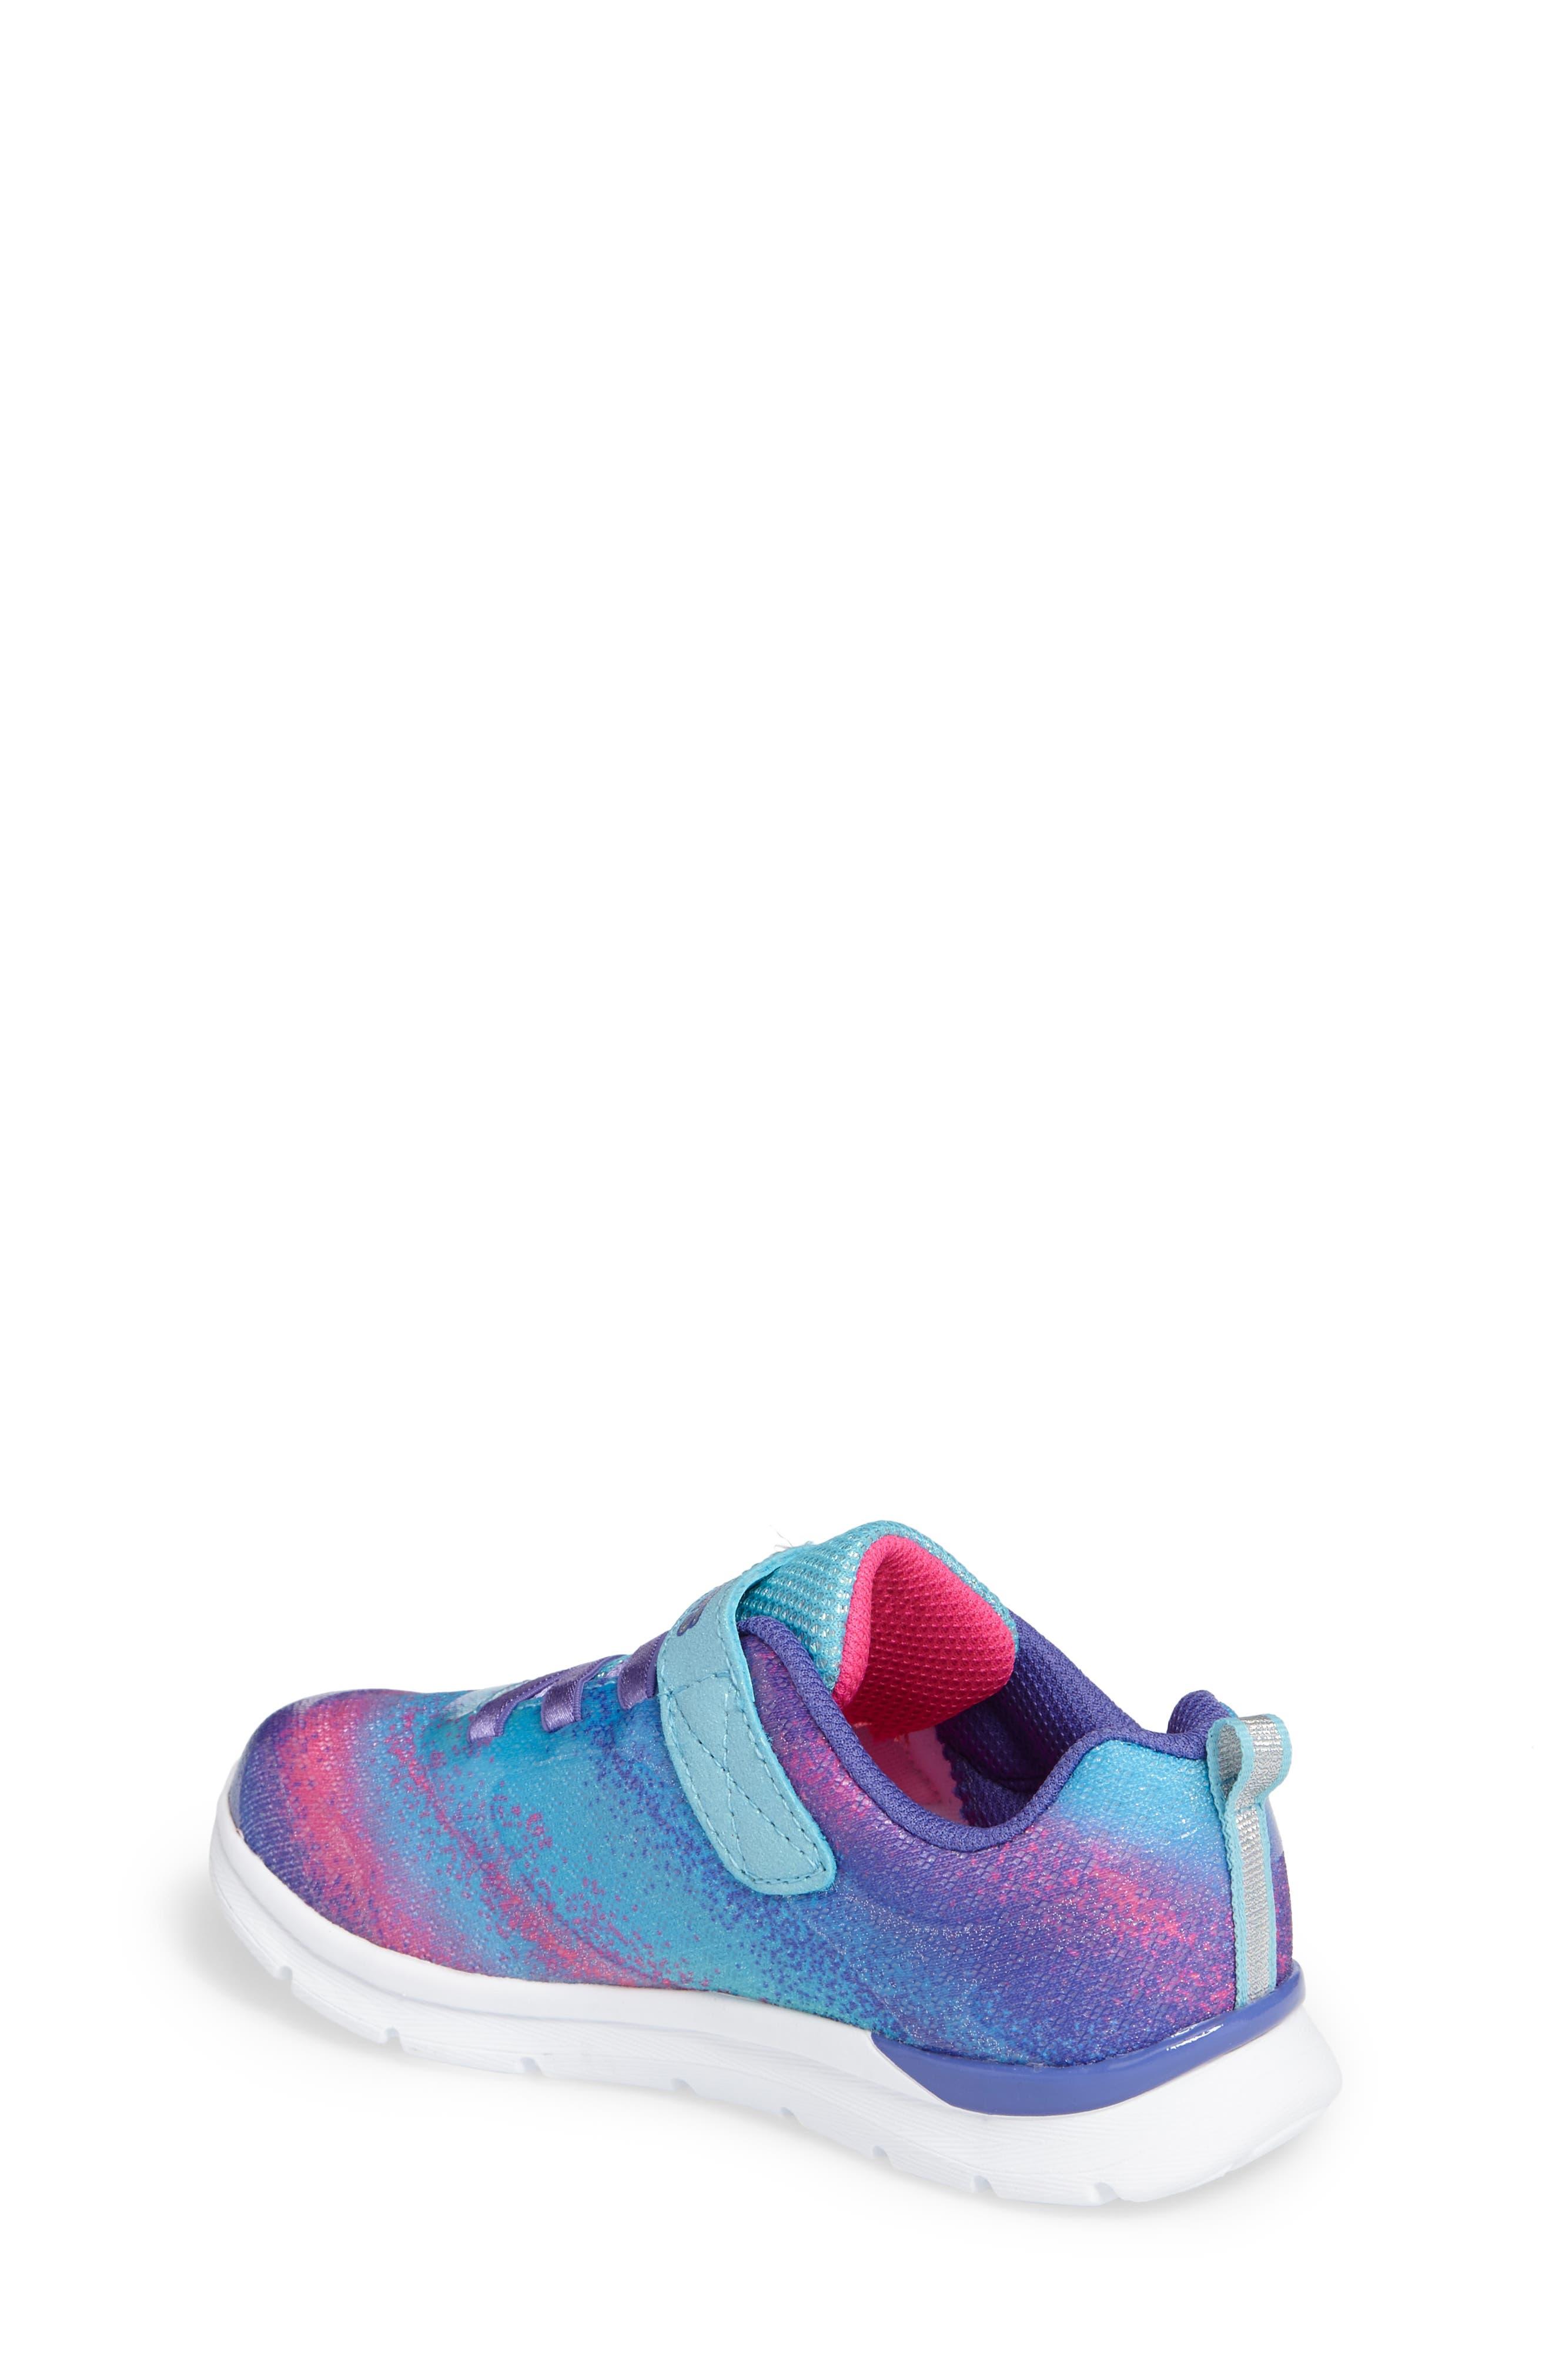 Skech-Lite Colorful Cutie Sneaker,                             Alternate thumbnail 2, color,